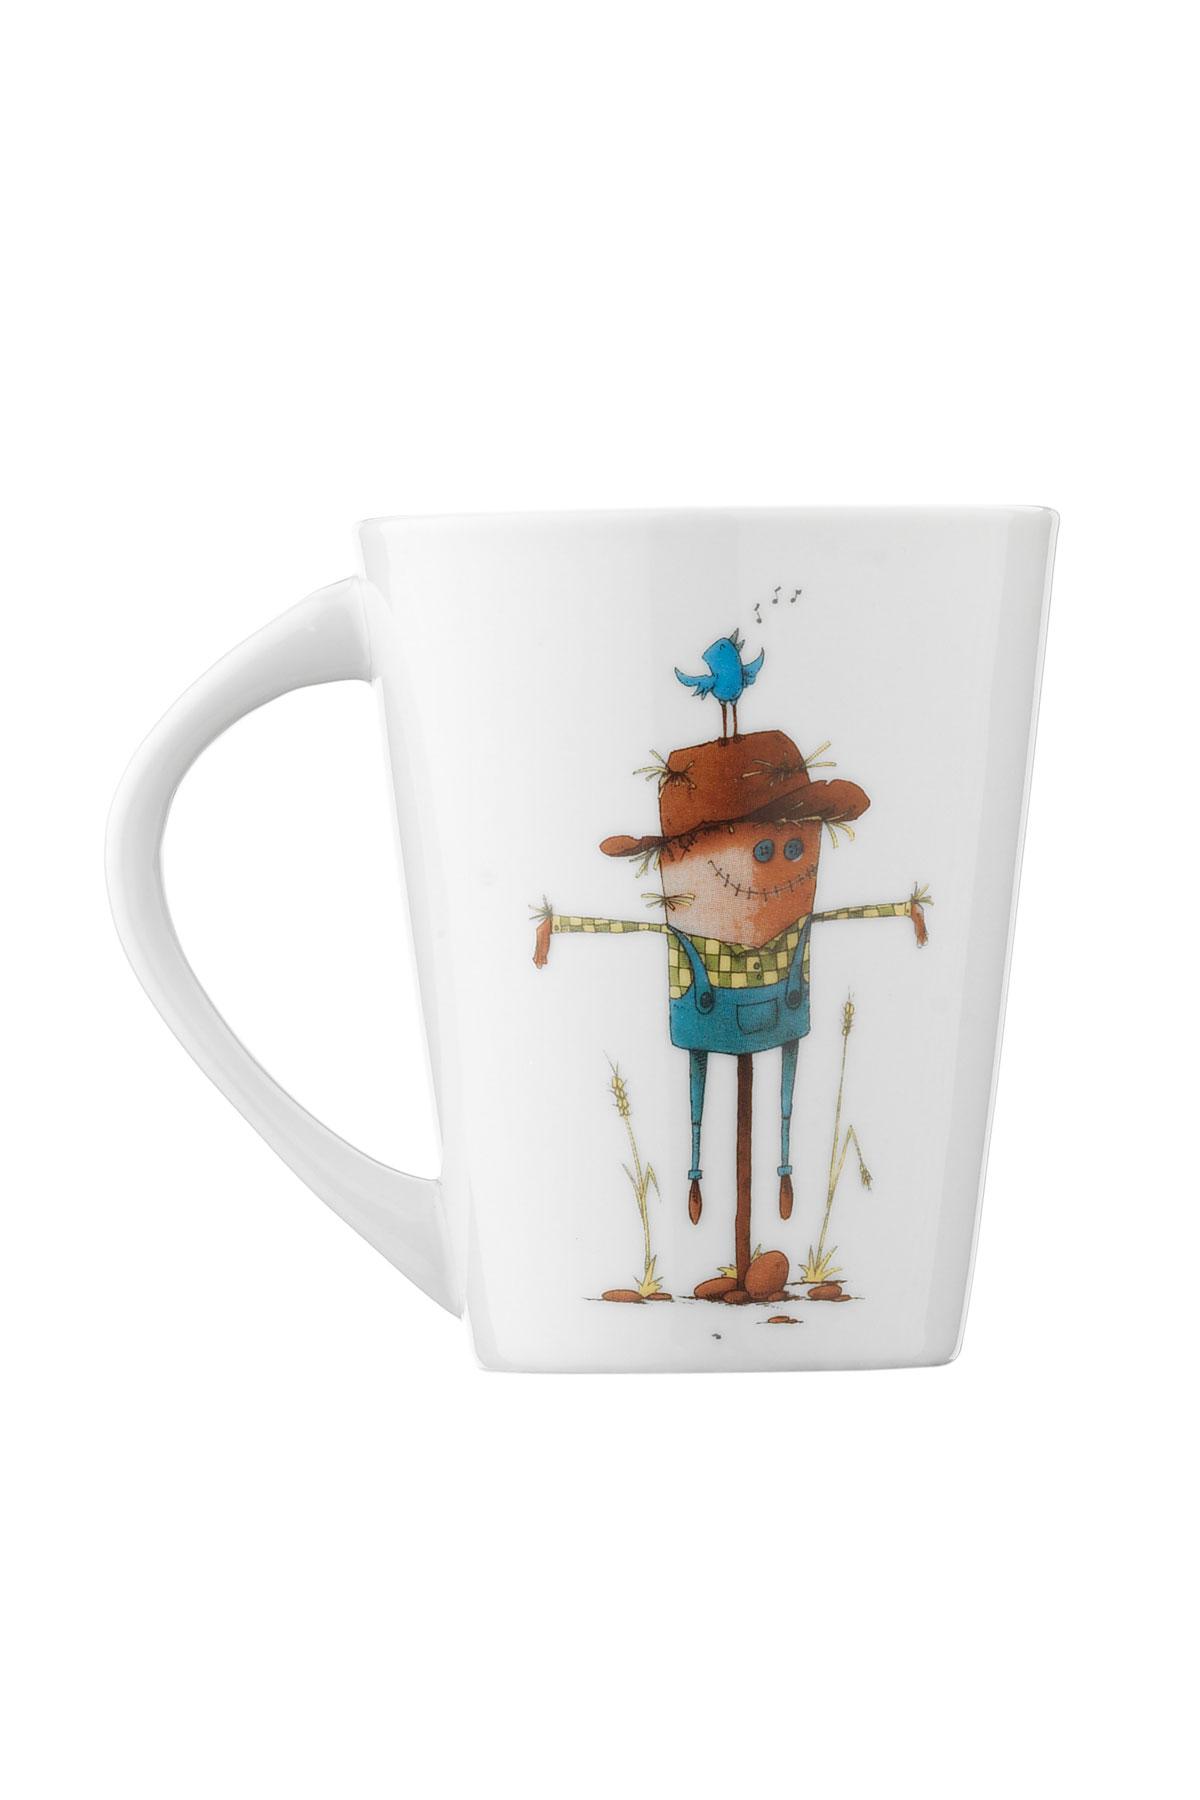 Kütahya Porselen 10947 Desen Mug Bardak